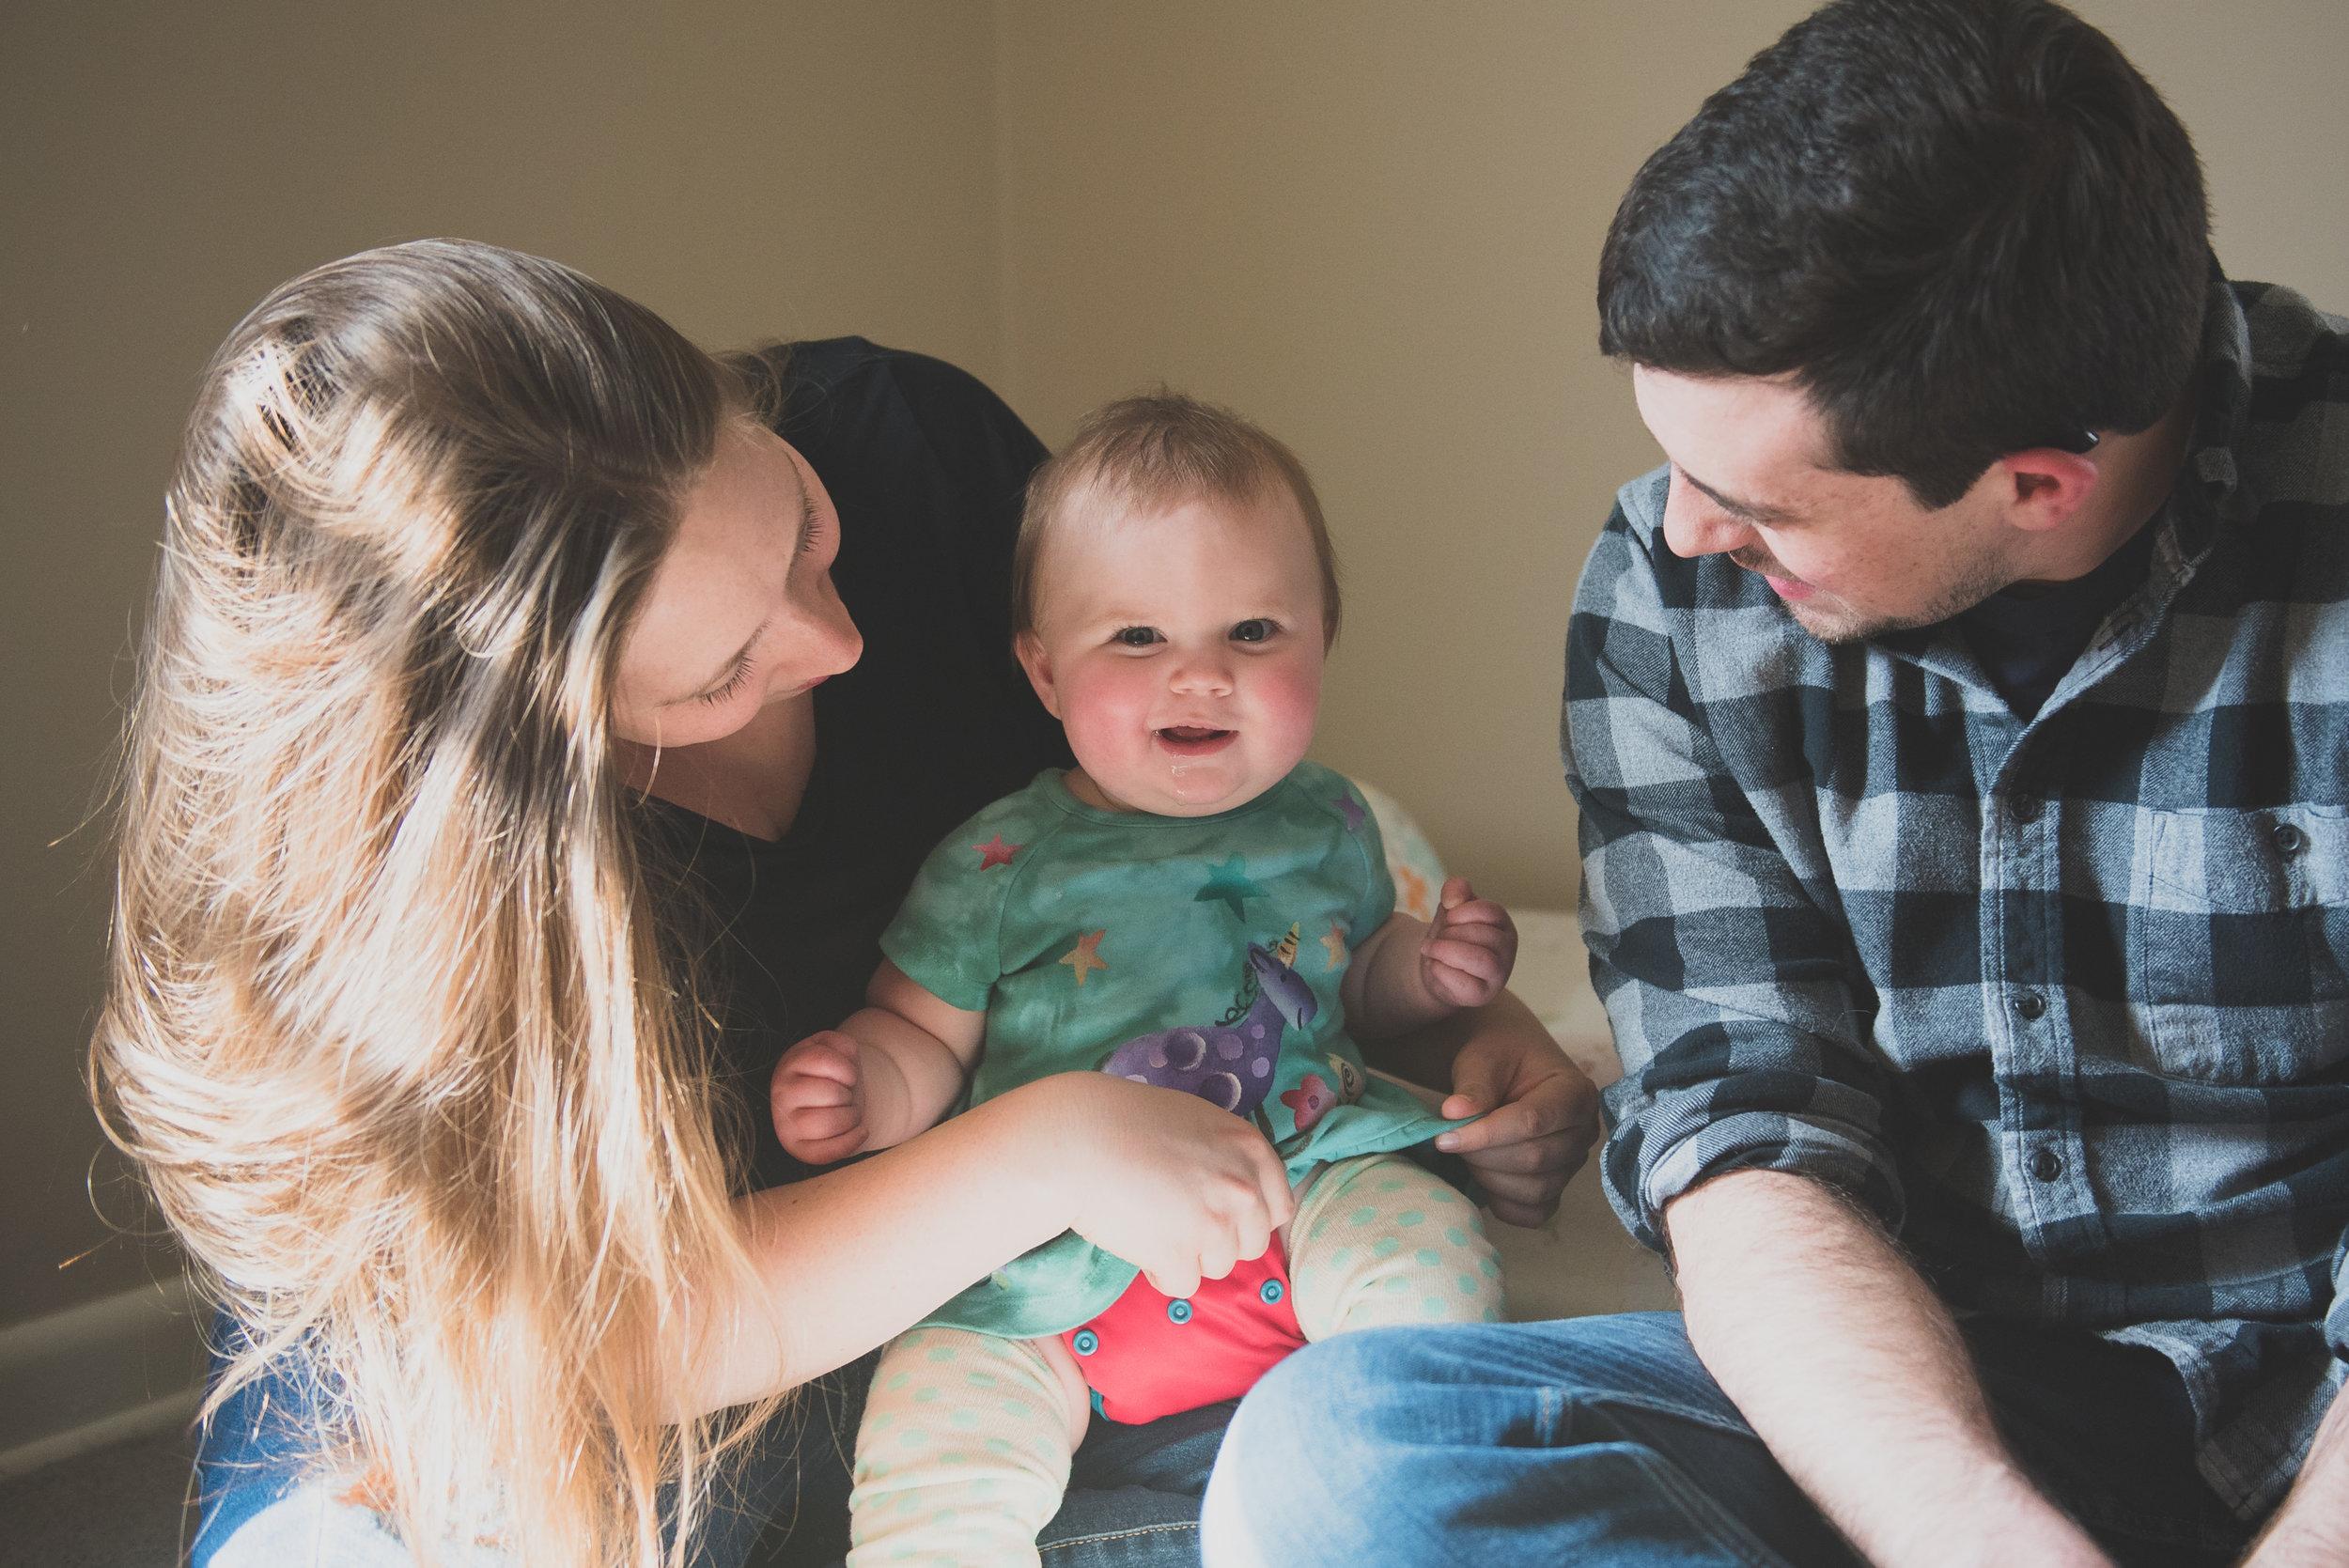 Emily_Hardy_Photography_Lincoln_Nebraska_Lifestyle_Family_Photography_RuthKohtz_0002.jpg